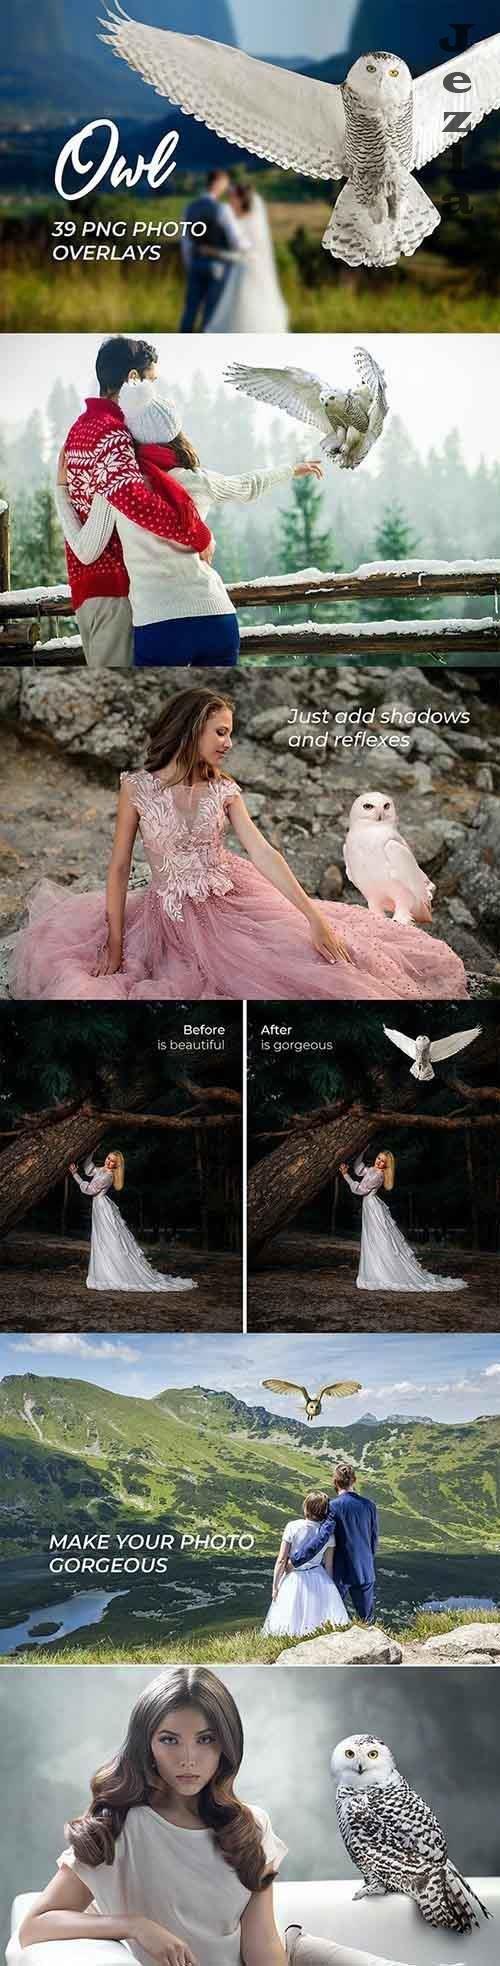 39 Owl Photo Overlays 3909270